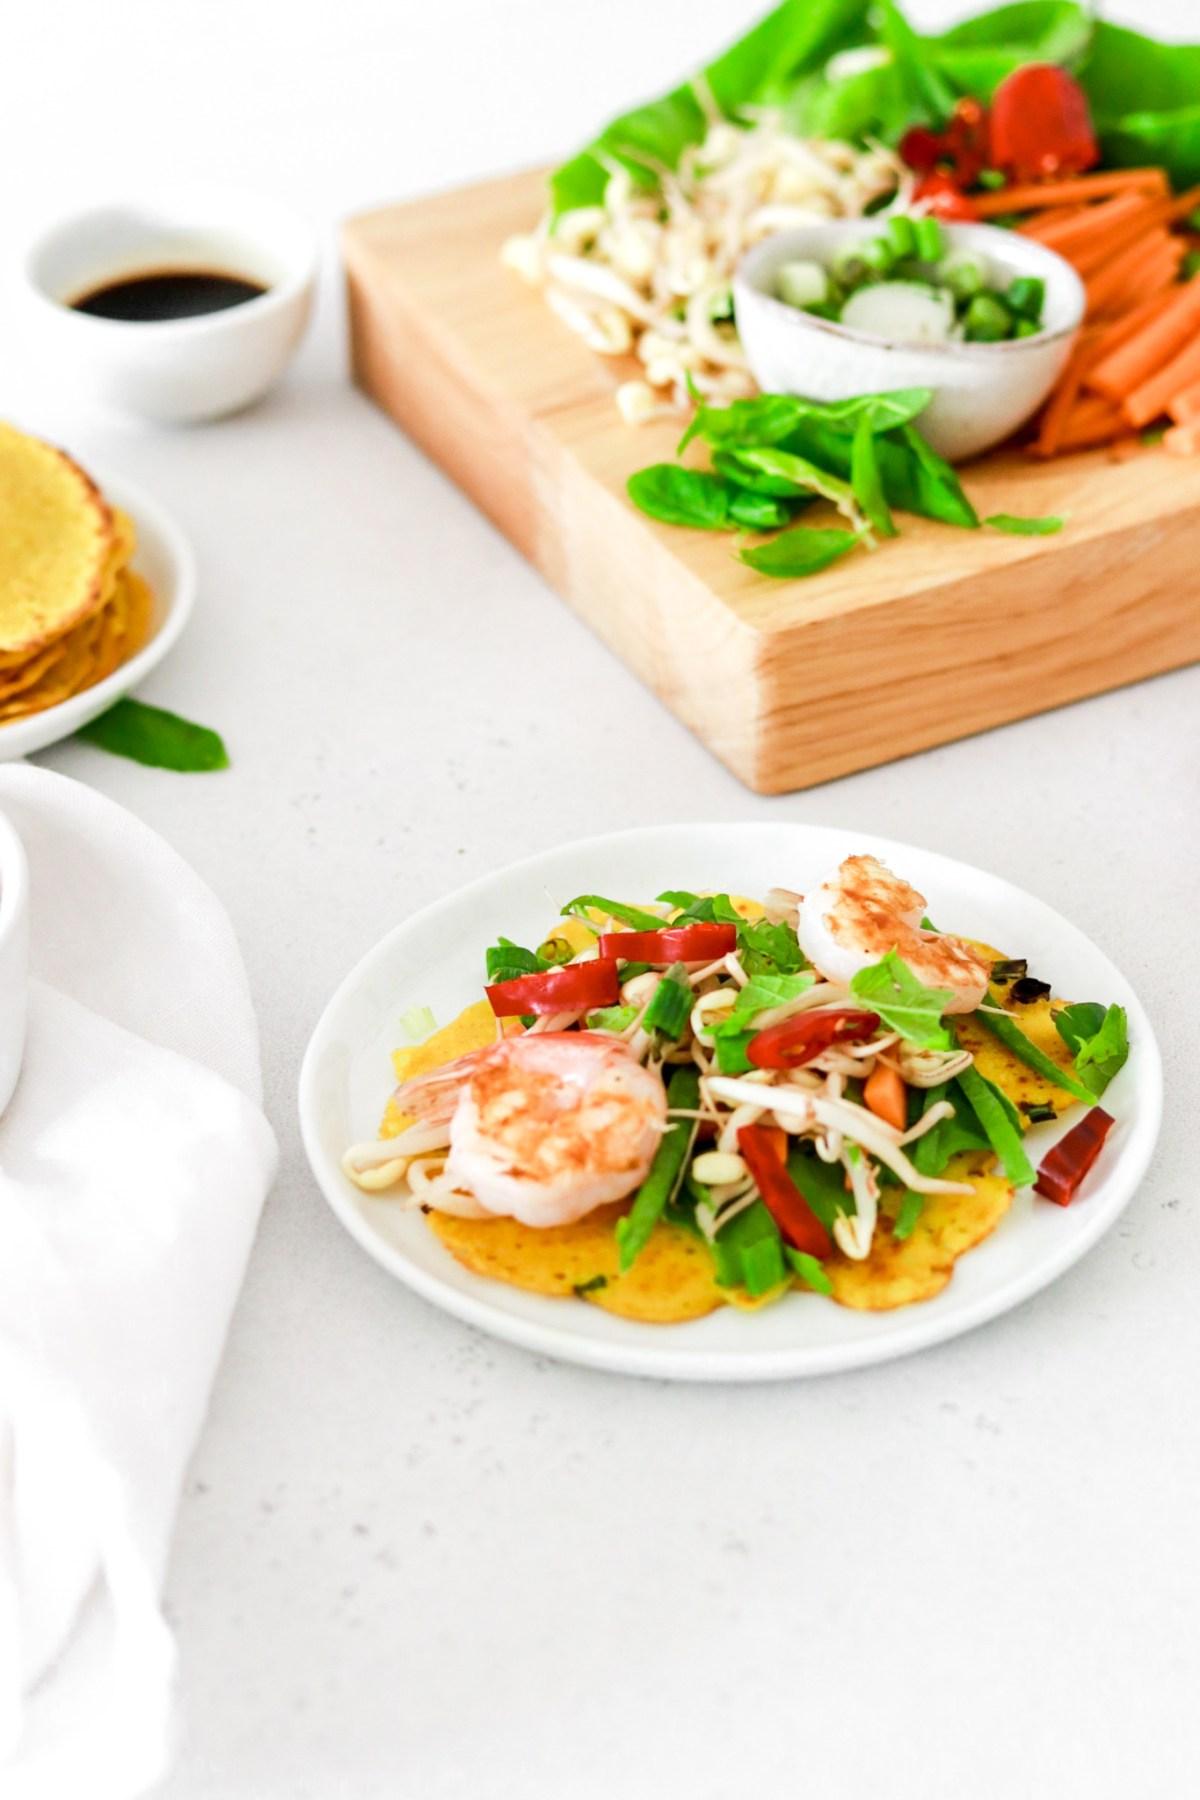 Bánh Xèo - Crispy Vietnamese Pancakes (Gluten Free) From Front